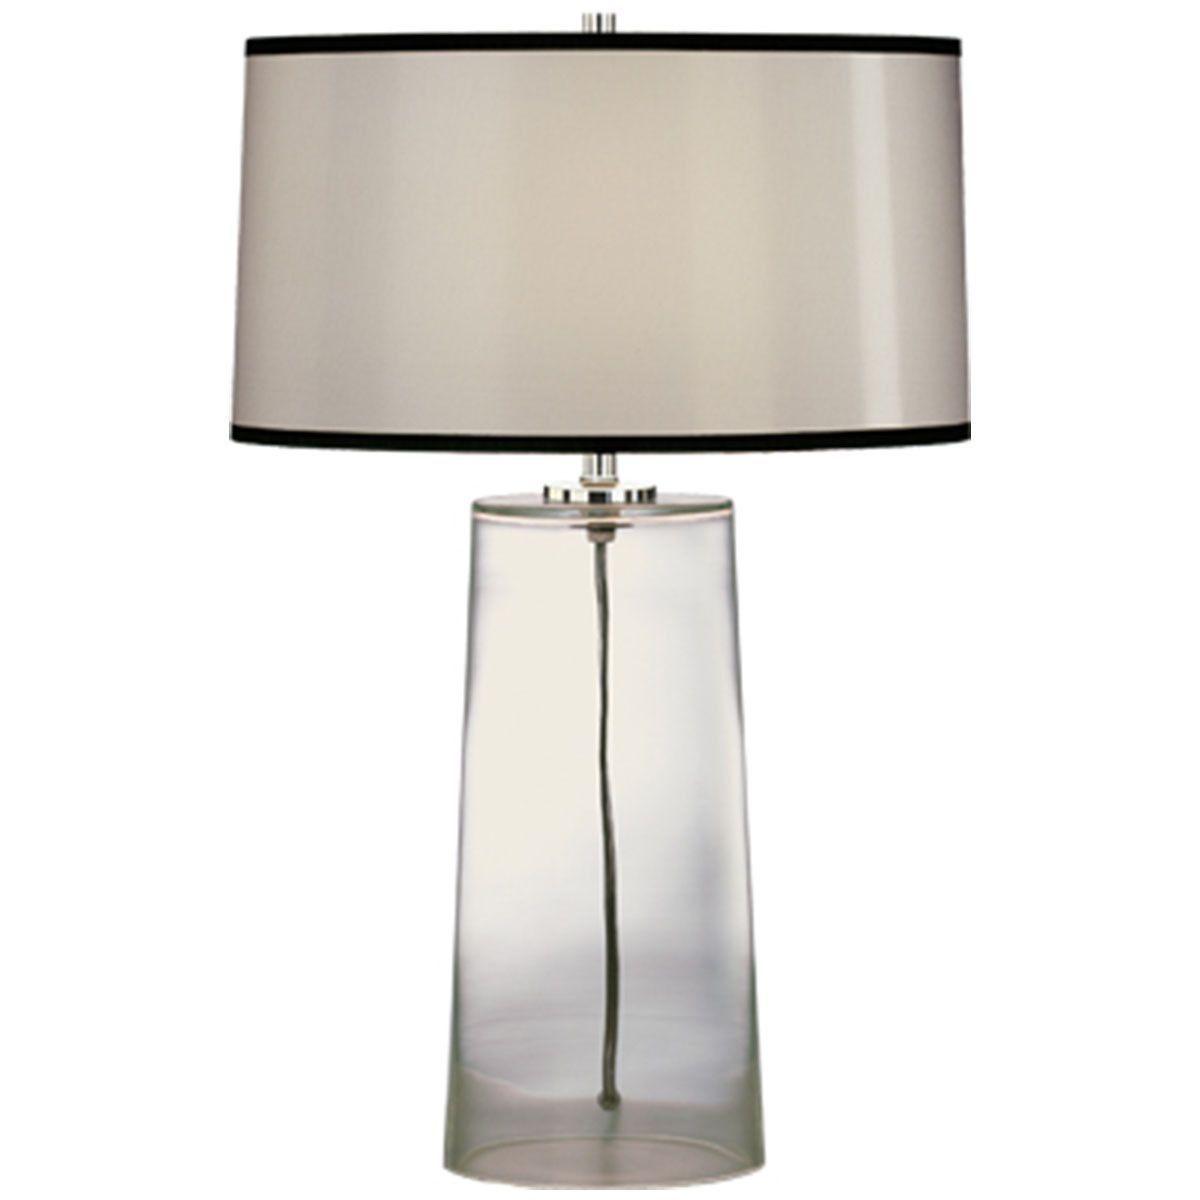 Robert Abbey Rico Espinet Olinda Table Lamp 1581W